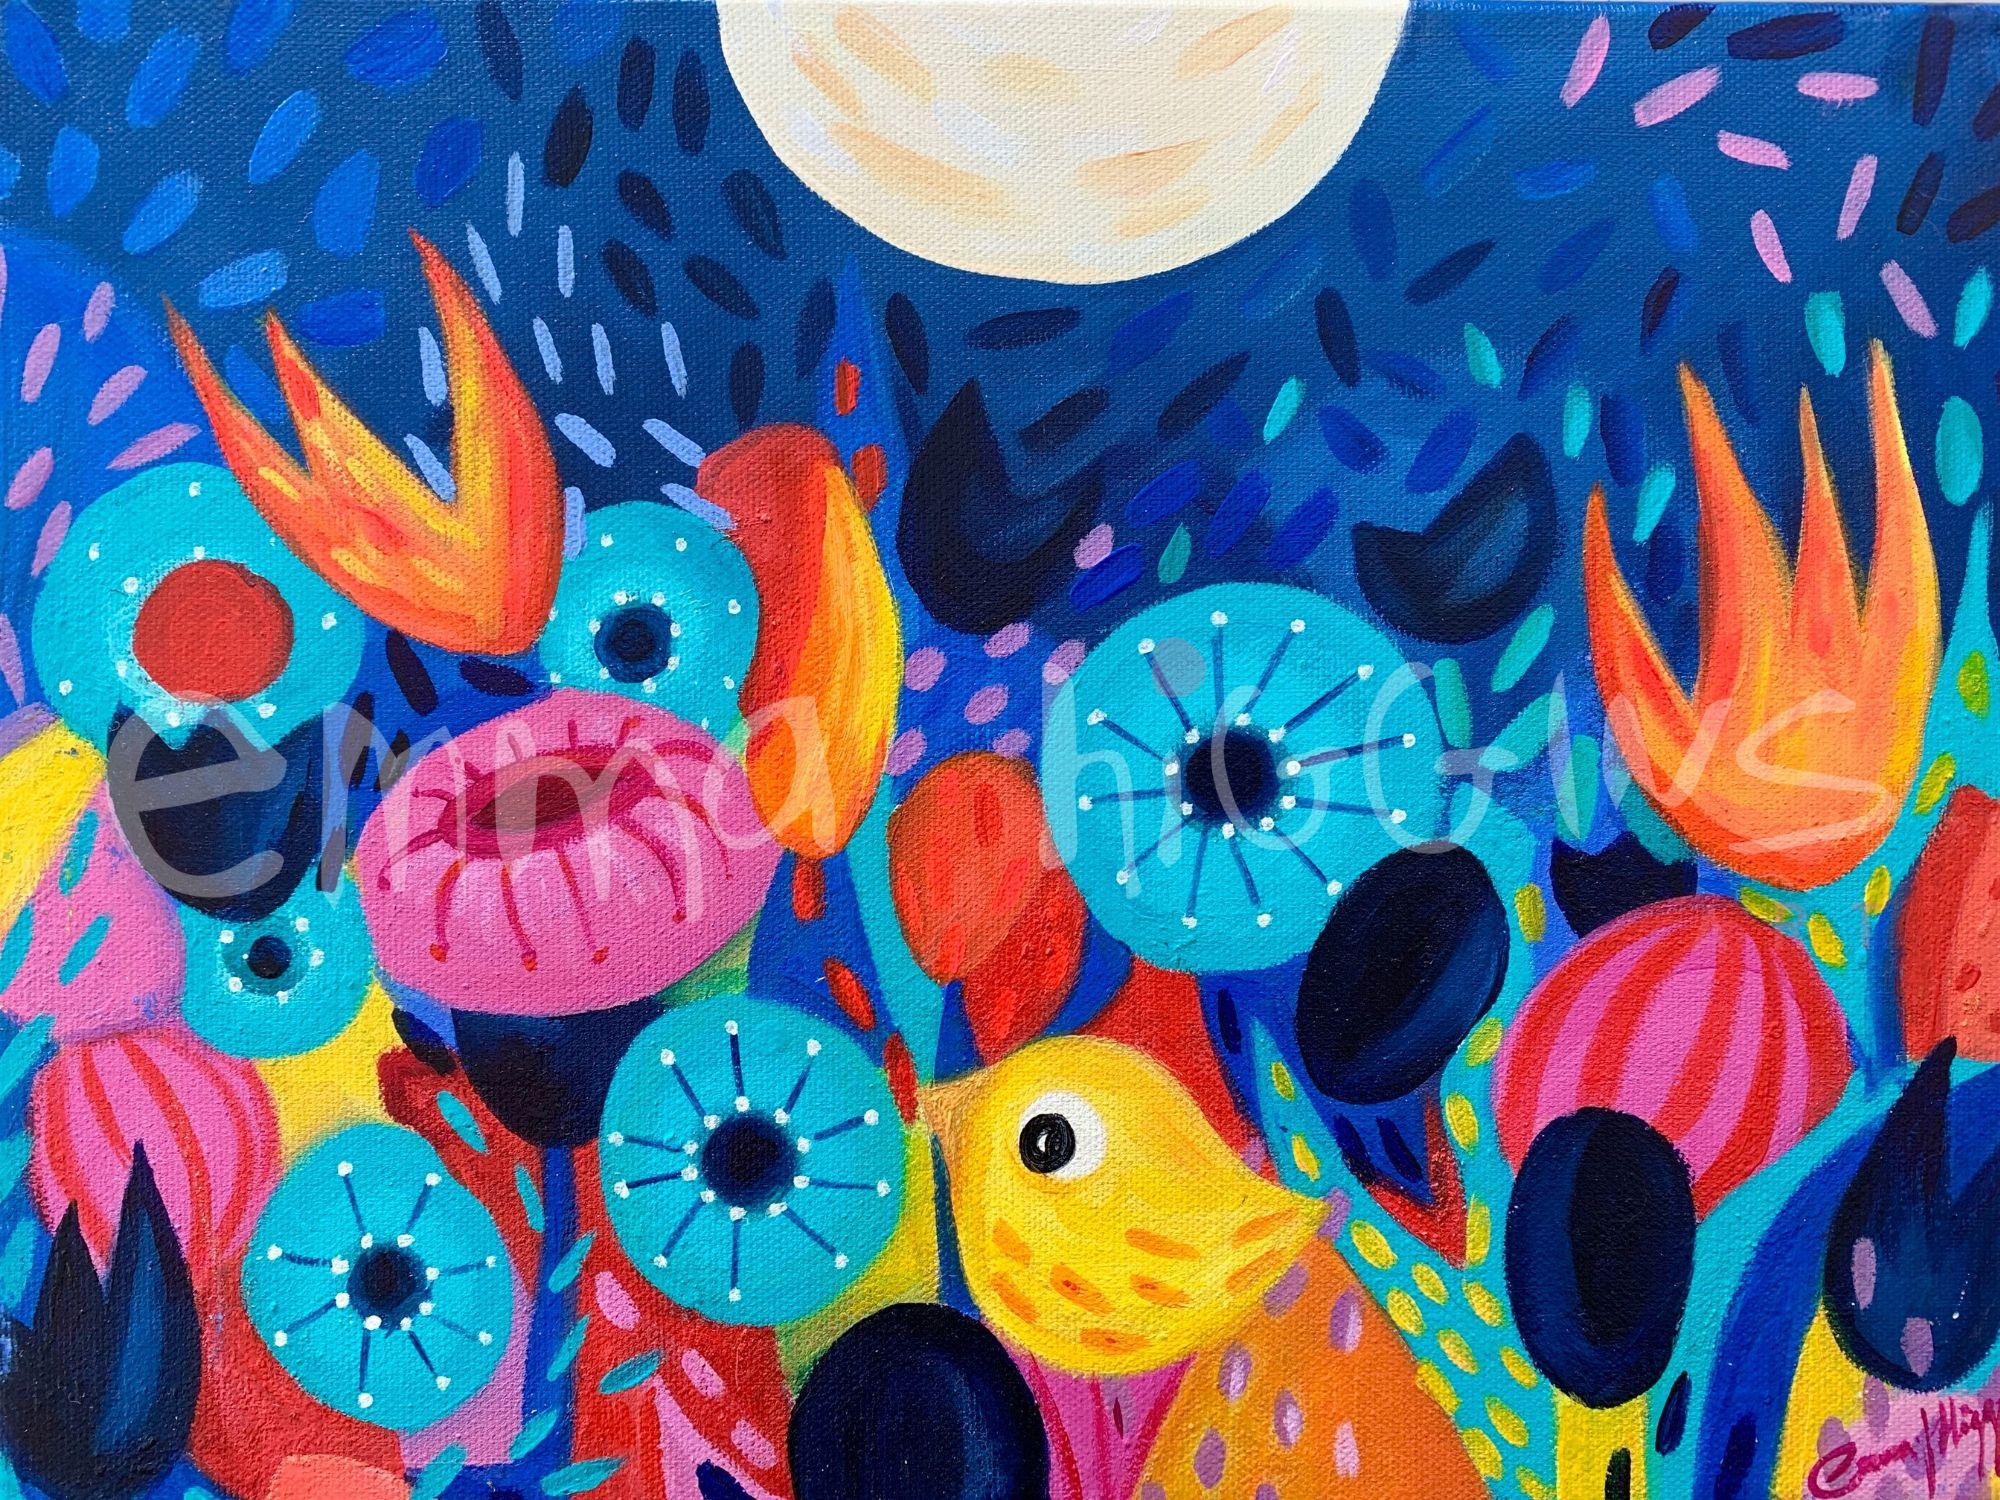 'Moondancing' 30 x 40 cm